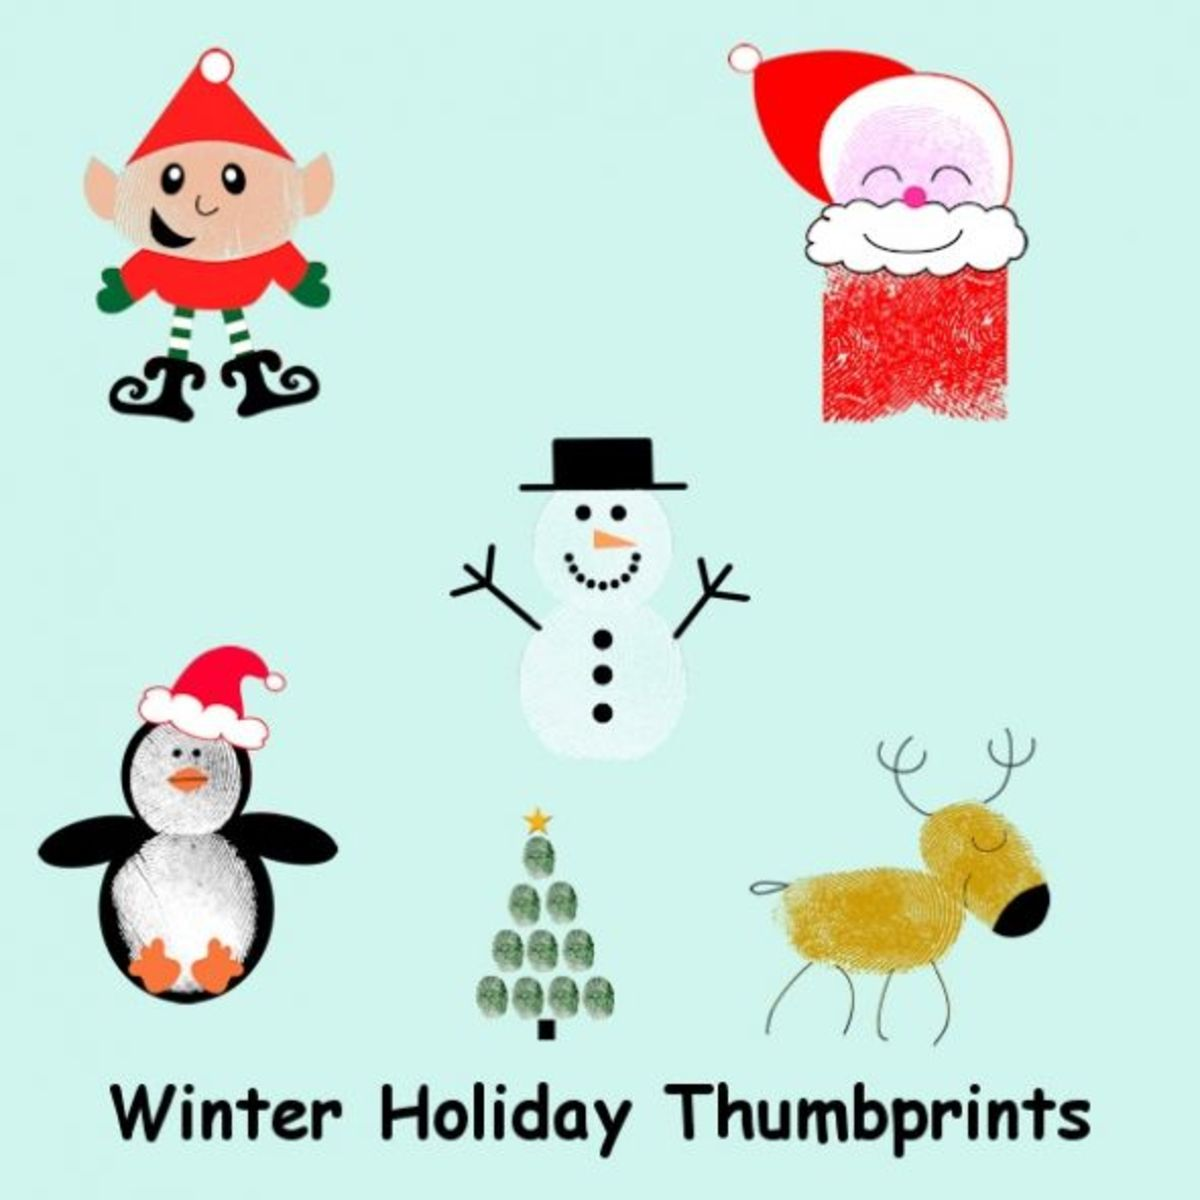 thumbprint_characters